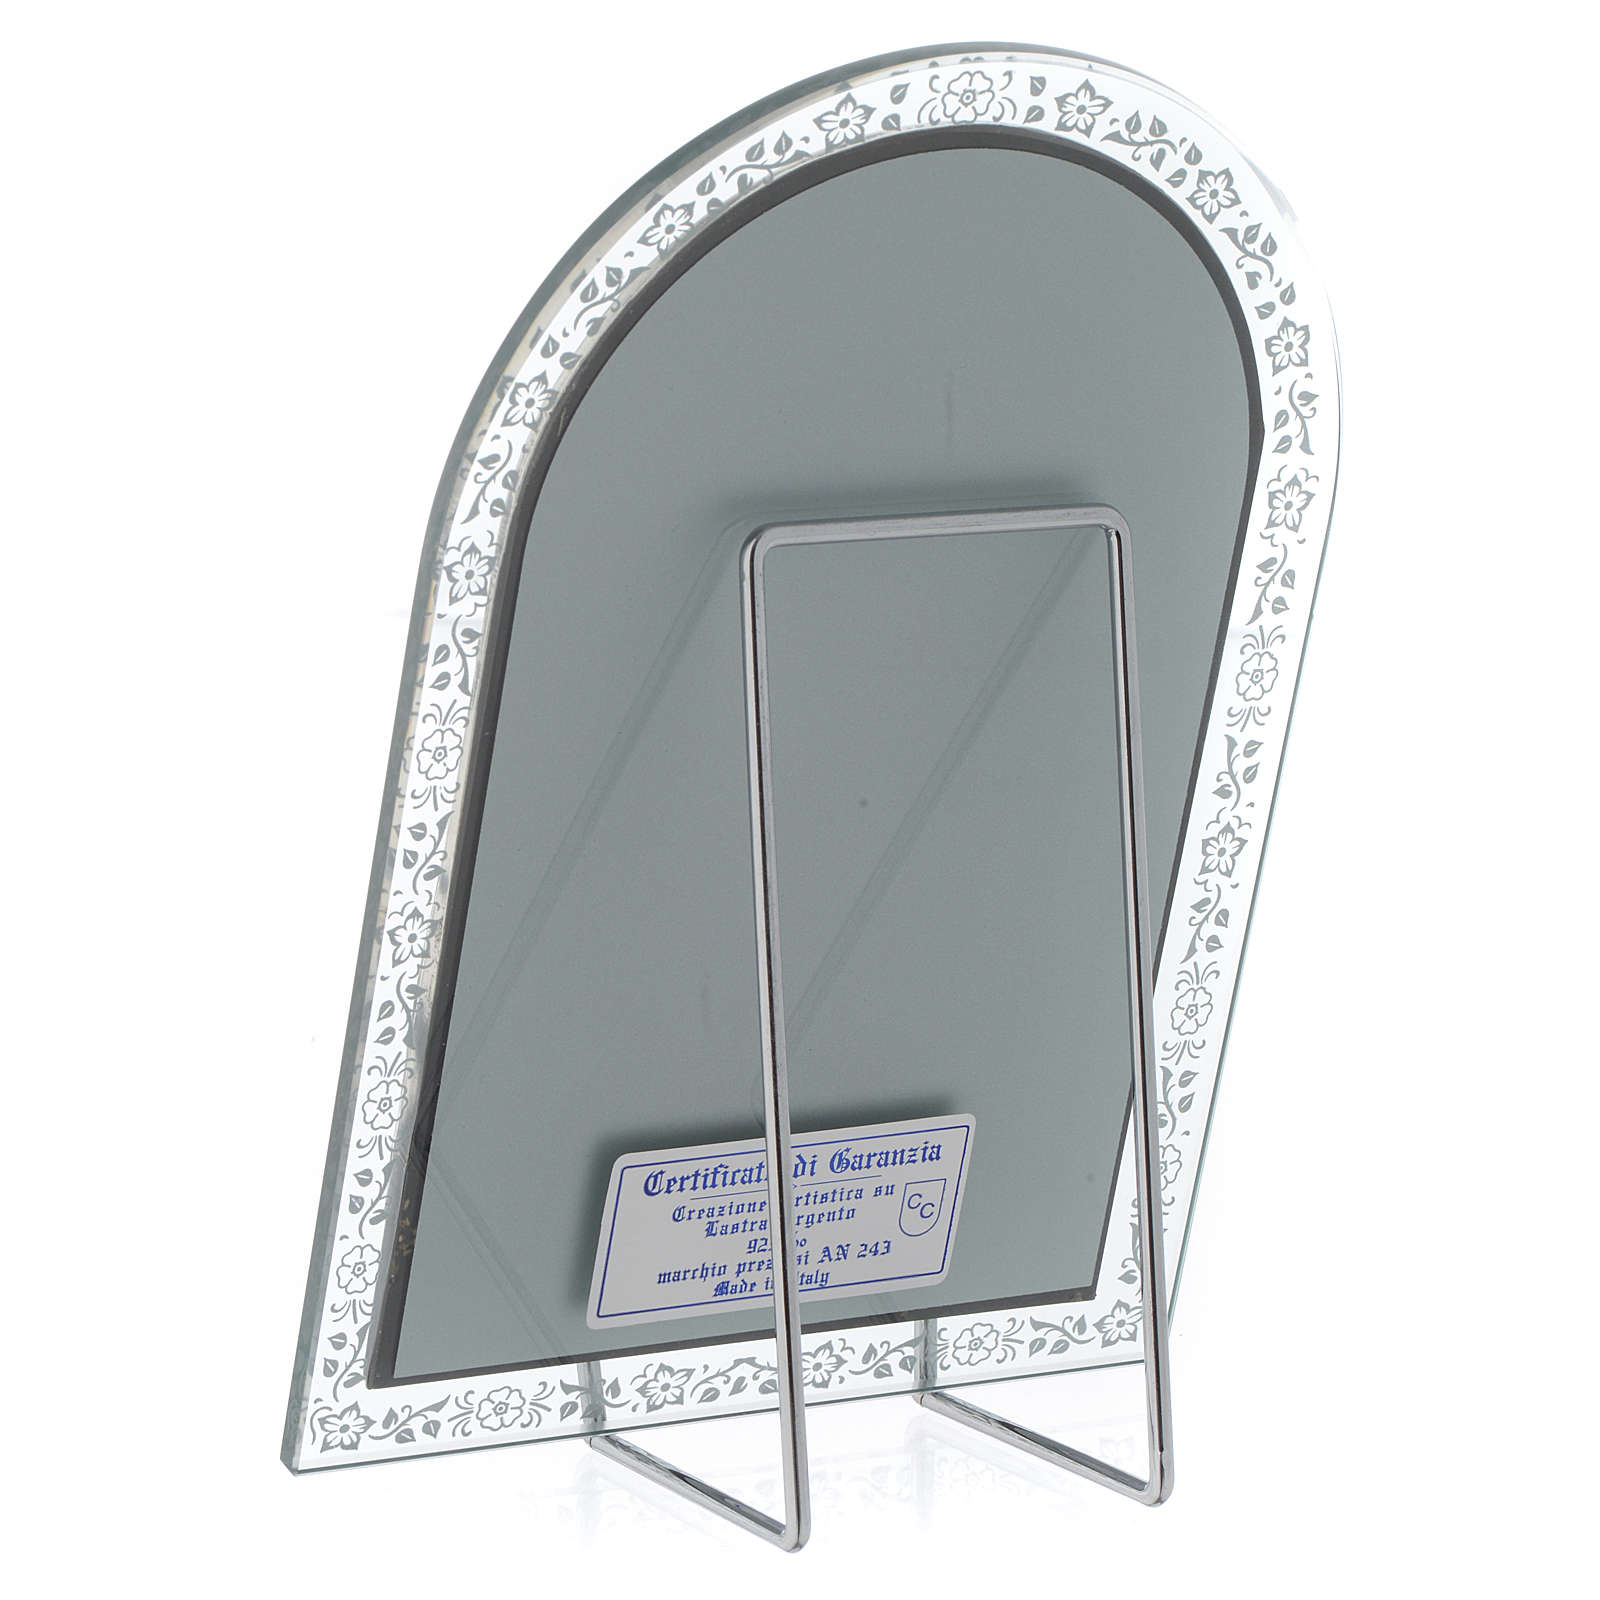 Madonna Ferruzzi płaskorzeźba srebro ramka szkło 4